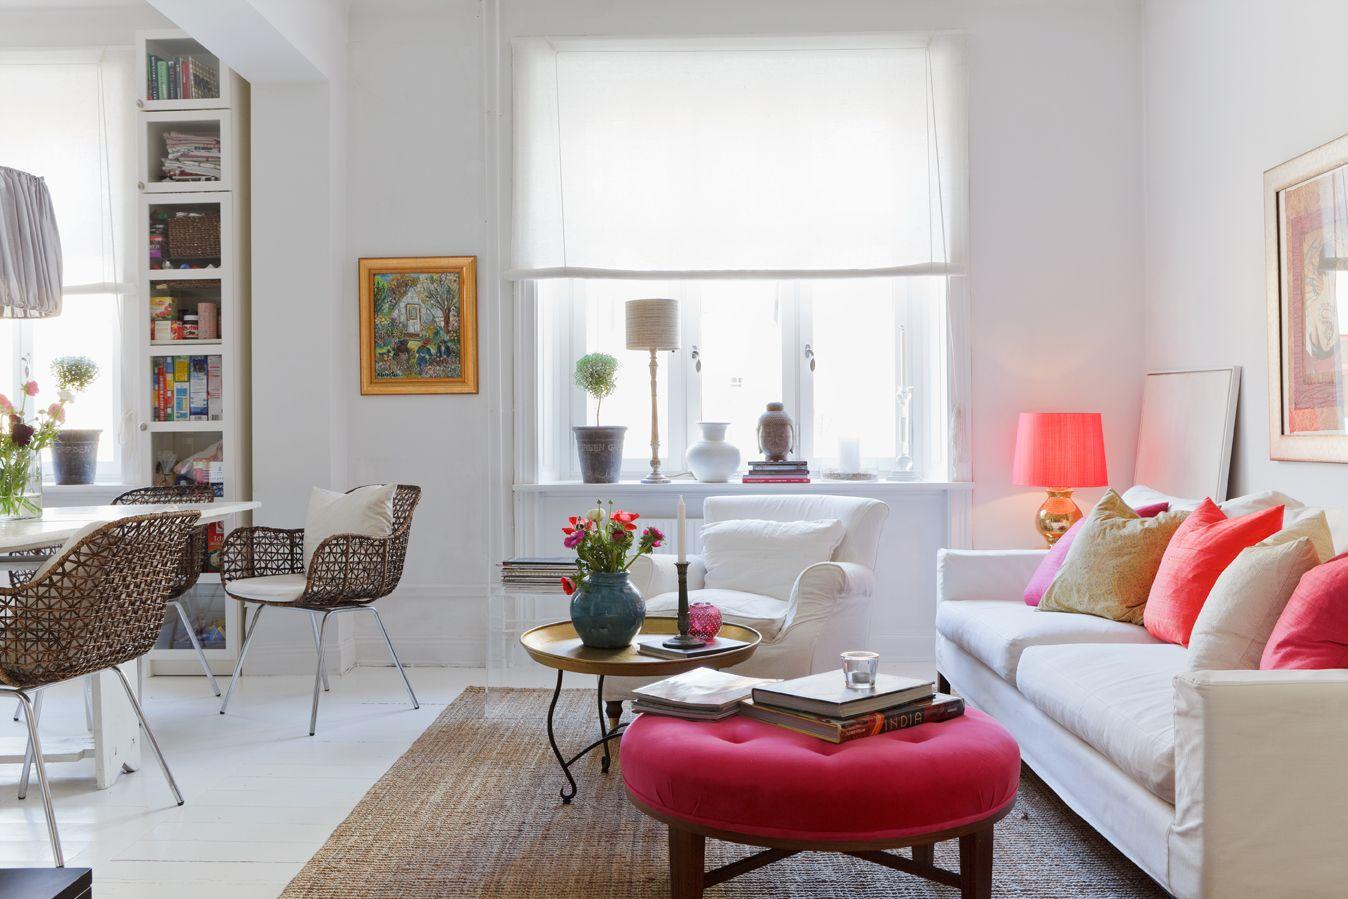 Hissgardiner | Living room white, Living rooms and Room